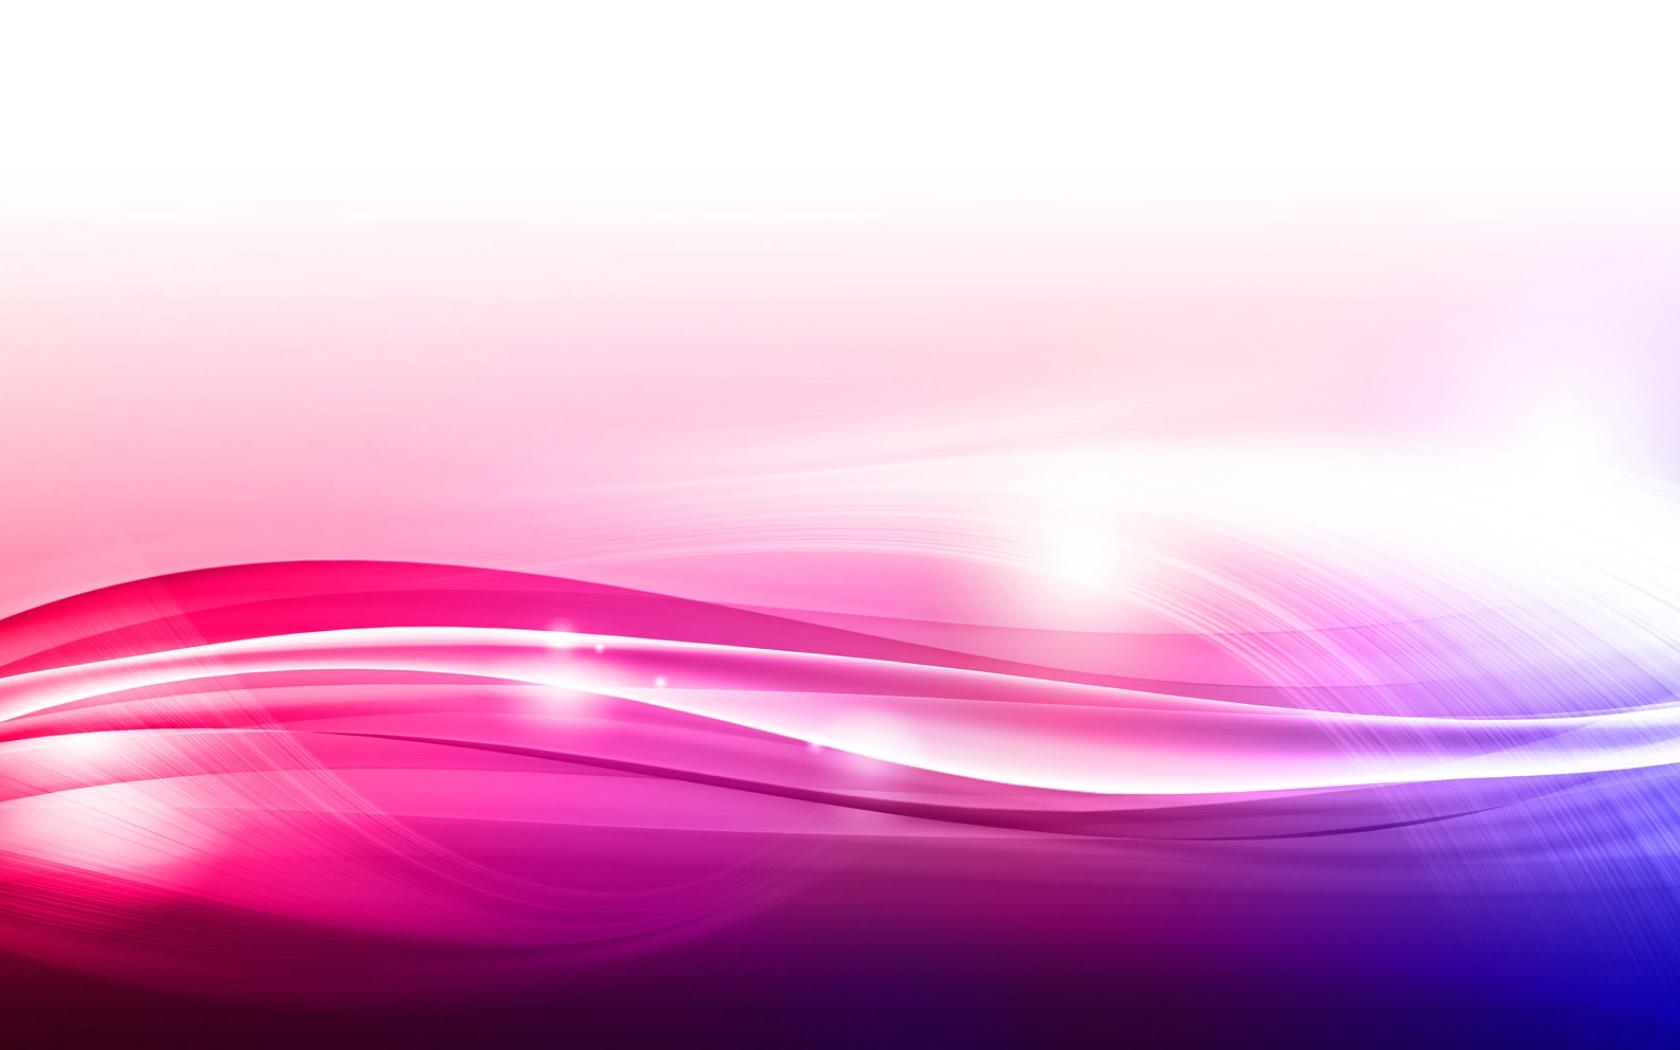 pink abstract wallpaper